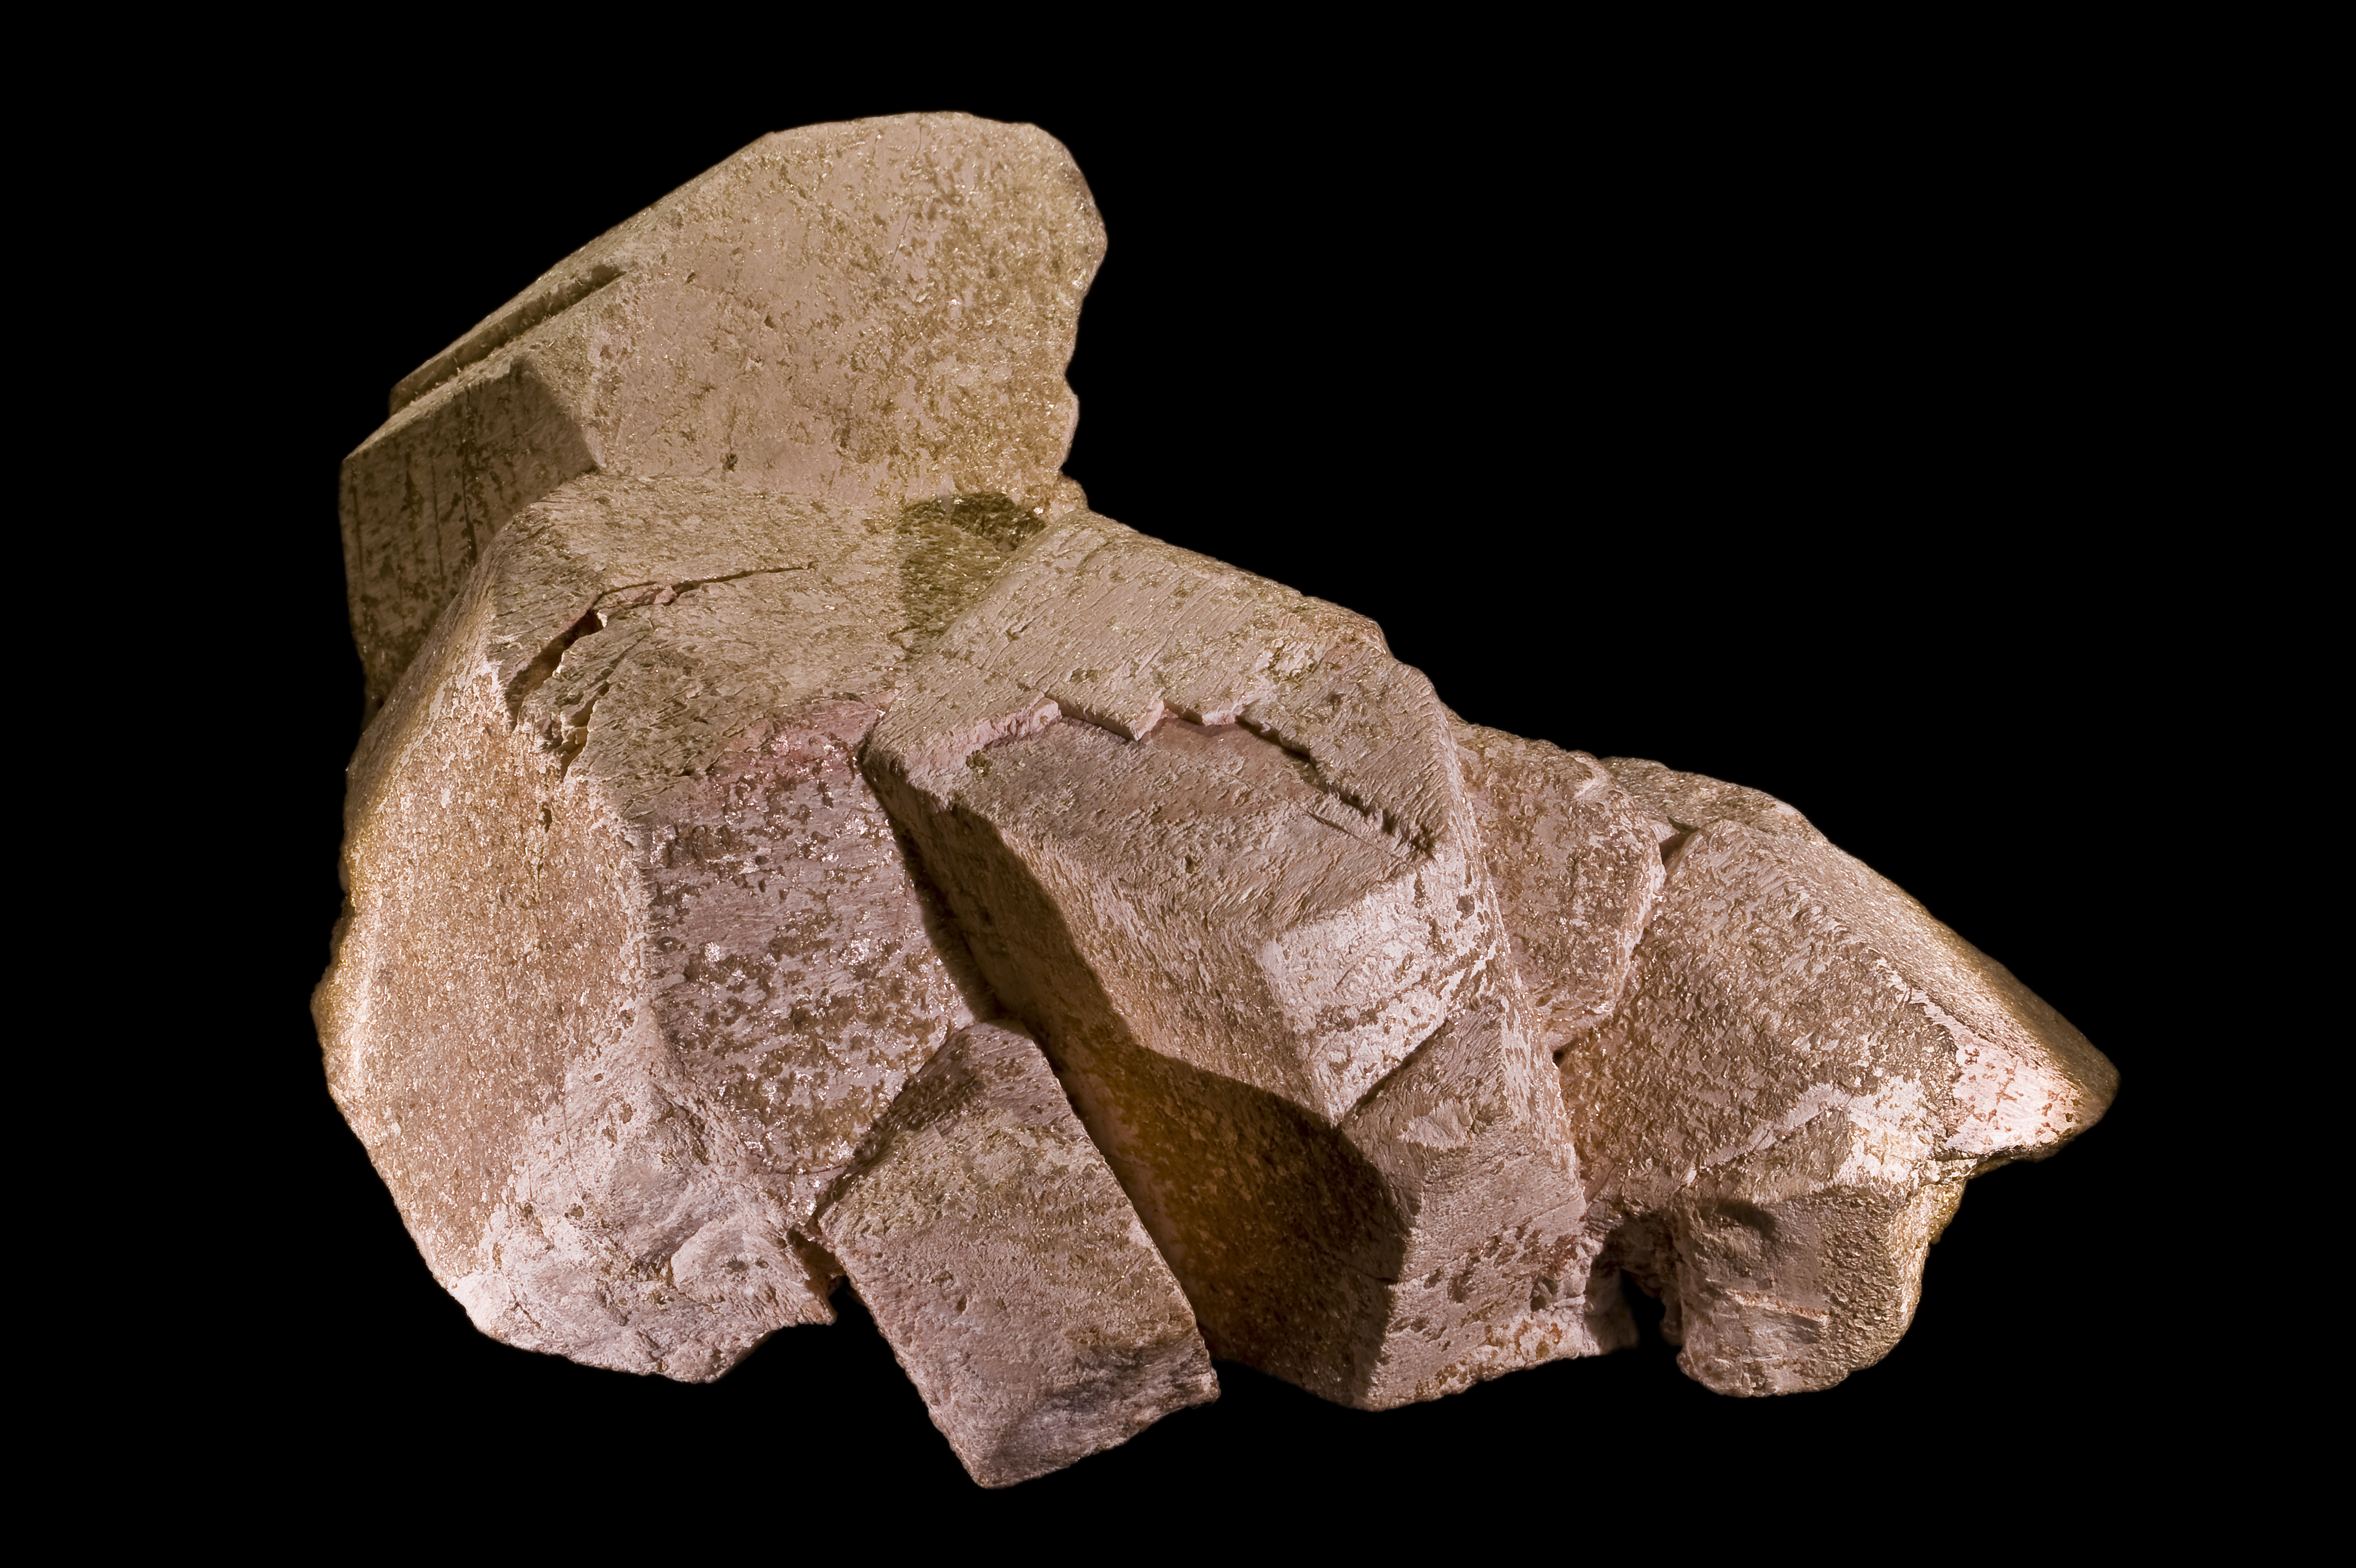 Depiction of Ortoclasa